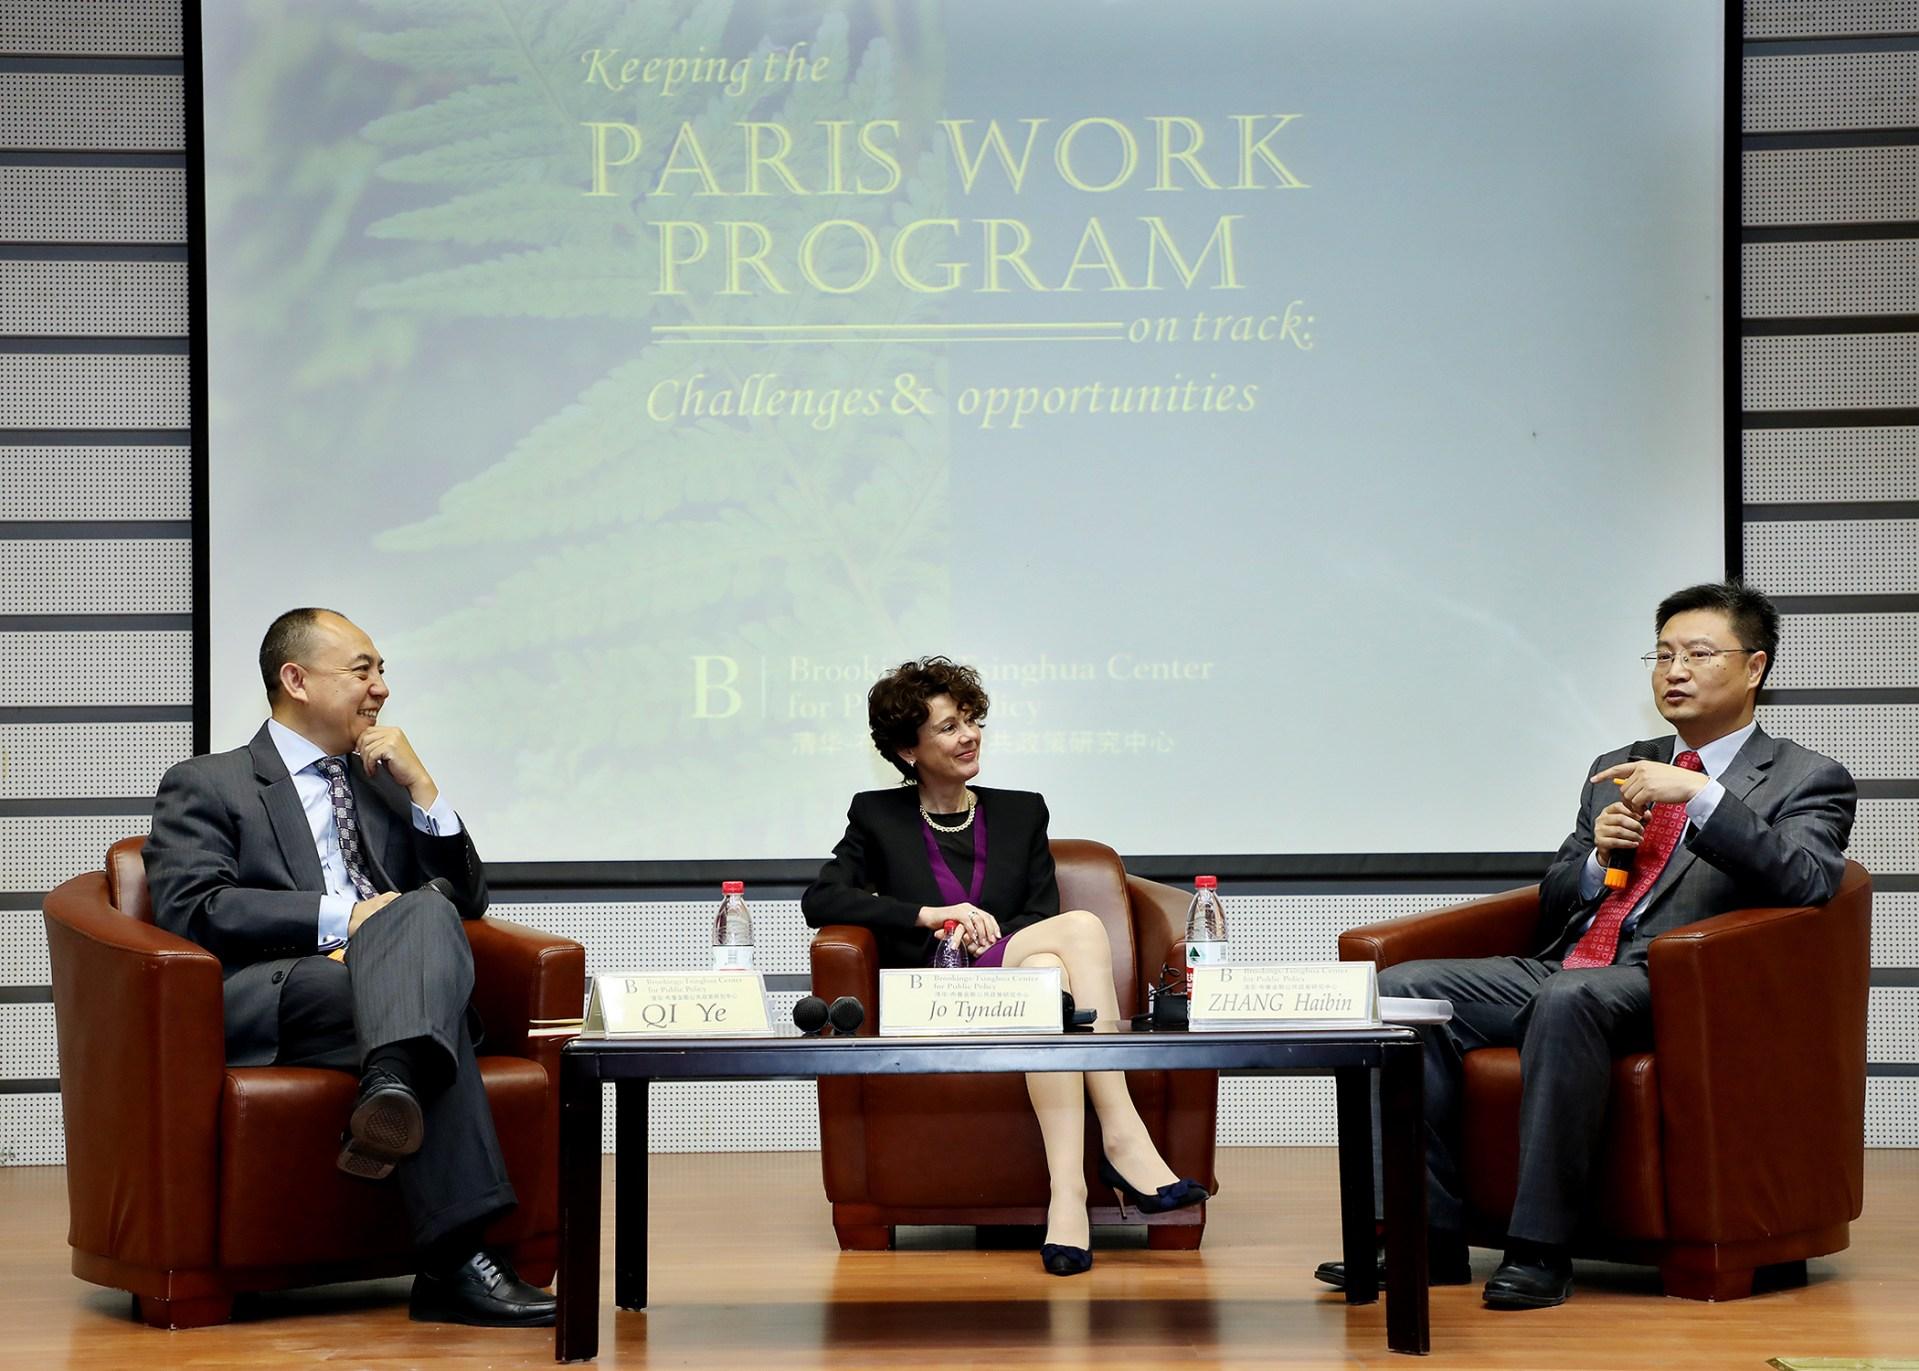 Above: QI Ye, Jo Tyndall, ZHANG haibin